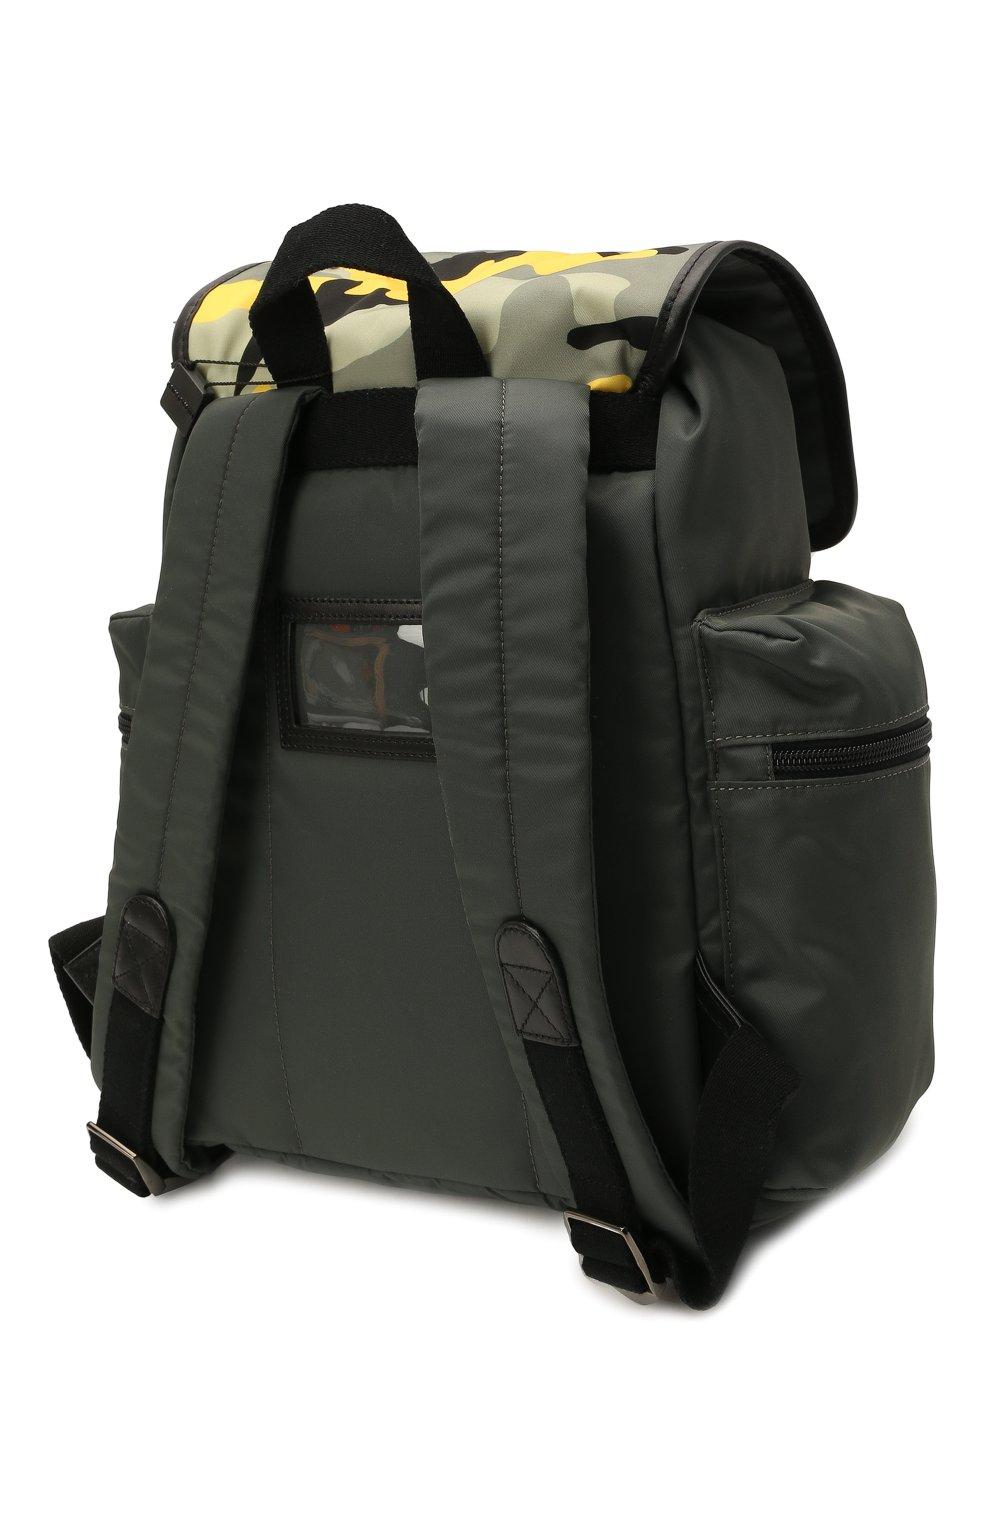 Детская рюкзак DOLCE & GABBANA хаки цвета, арт. EM0100/AA601 | Фото 2 (Материал: Натуральная кожа, Текстиль)